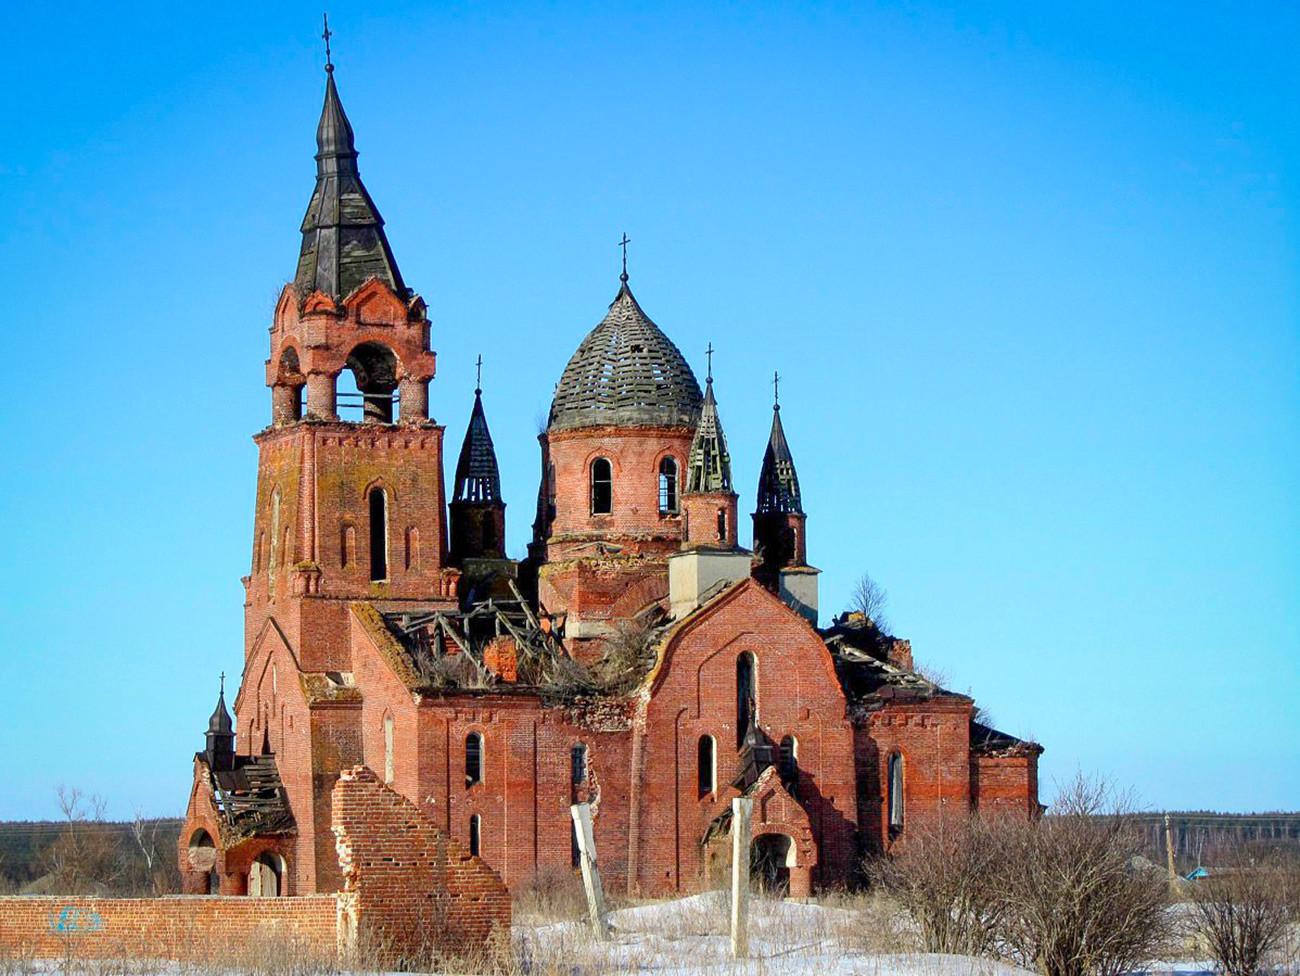 Liebfrauenkirche im Dorf Pjot, Anfang des 20. Jahrhunderts, Region Rjasan